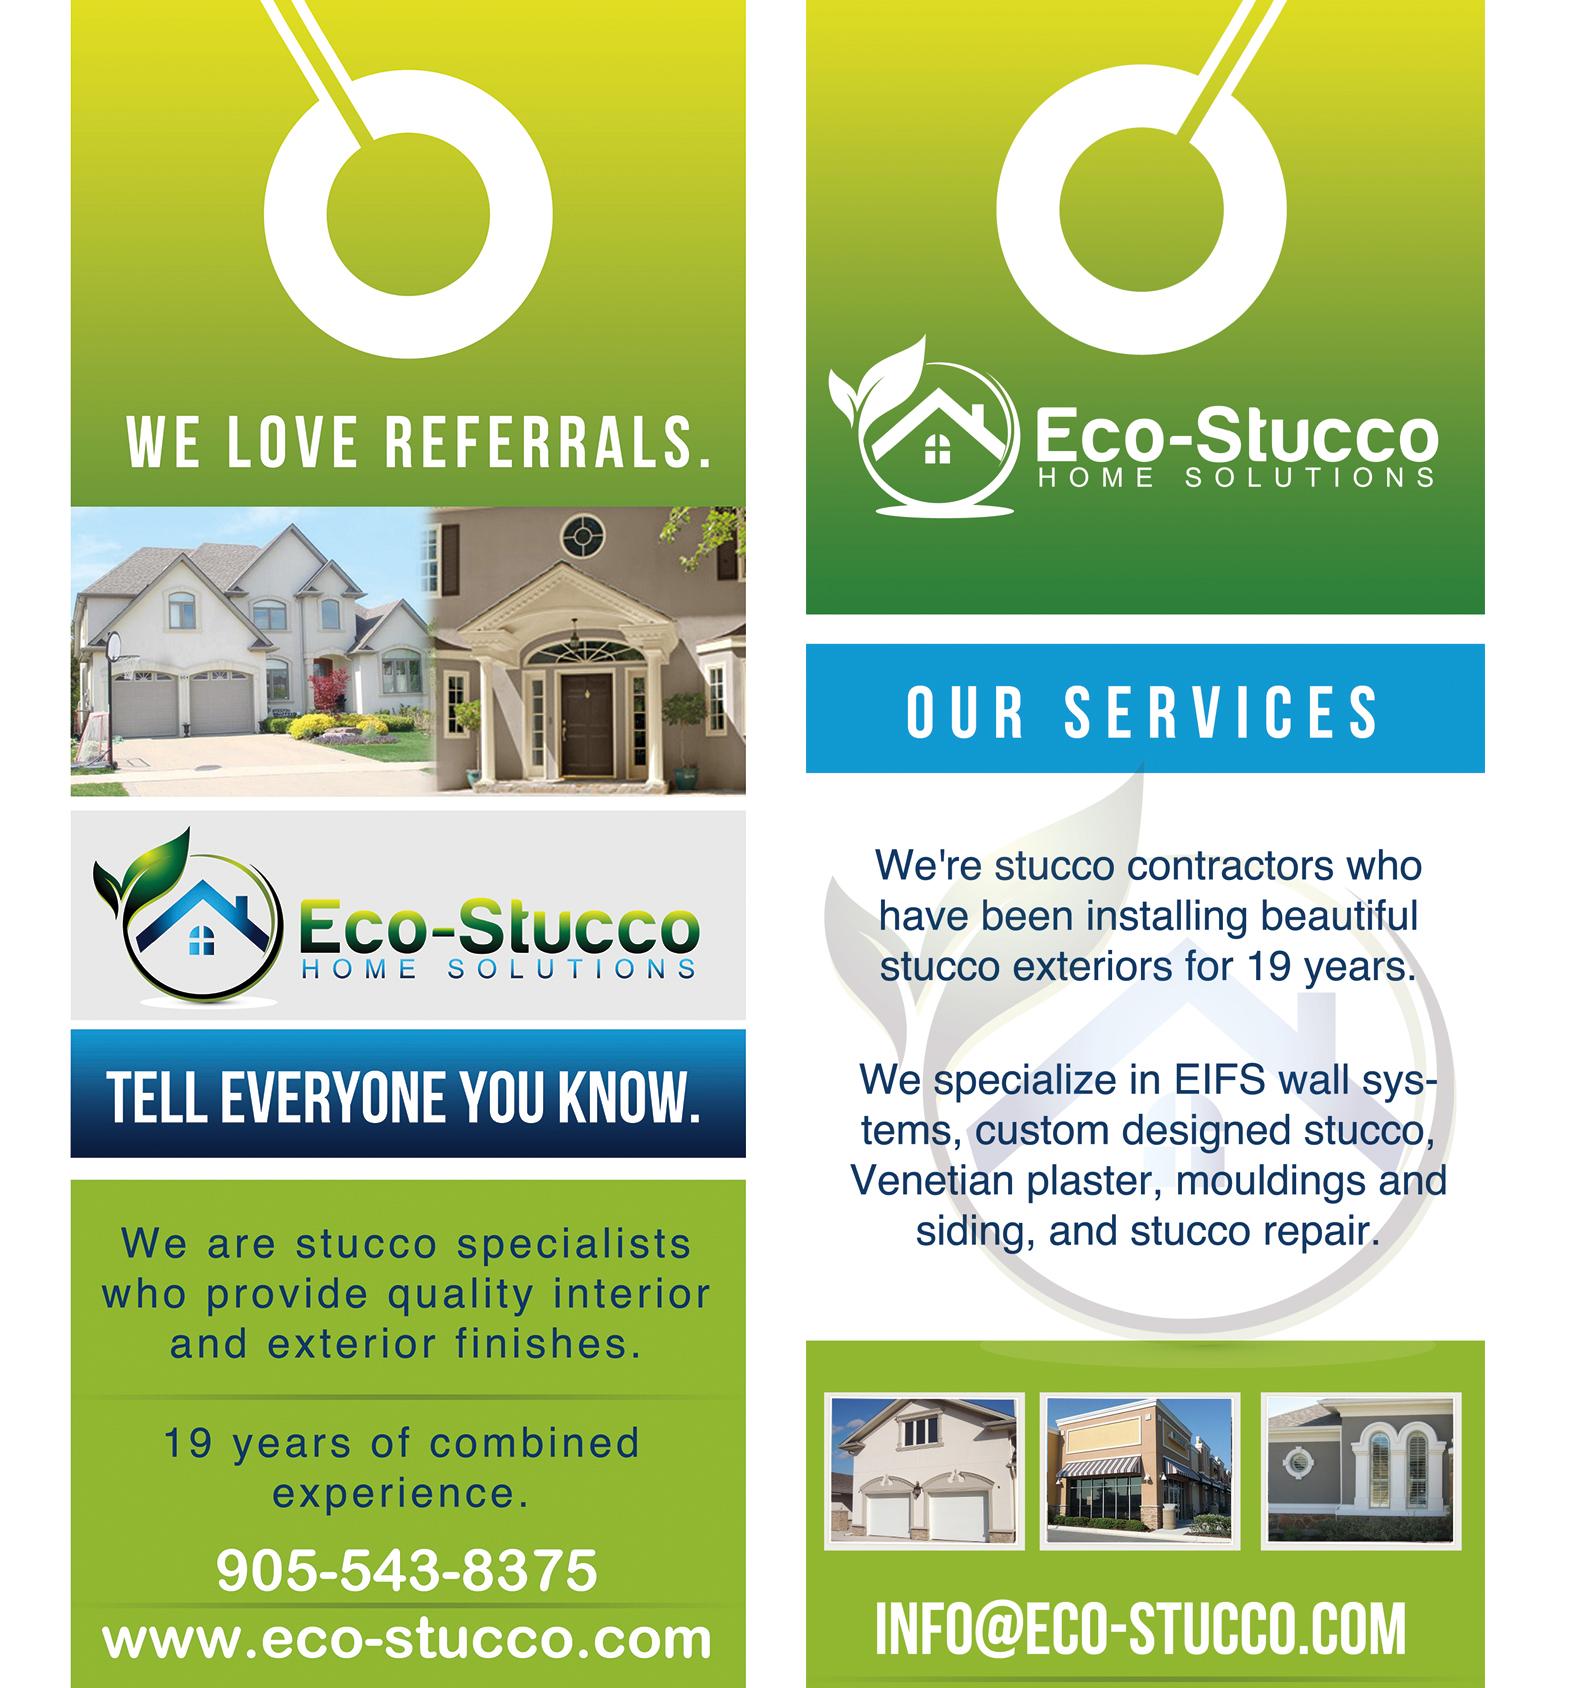 Custom Design by mediaproductionart - Entry No. 26 in the Custom Design Contest Eco-Stucco Home Solutions Custom Design.